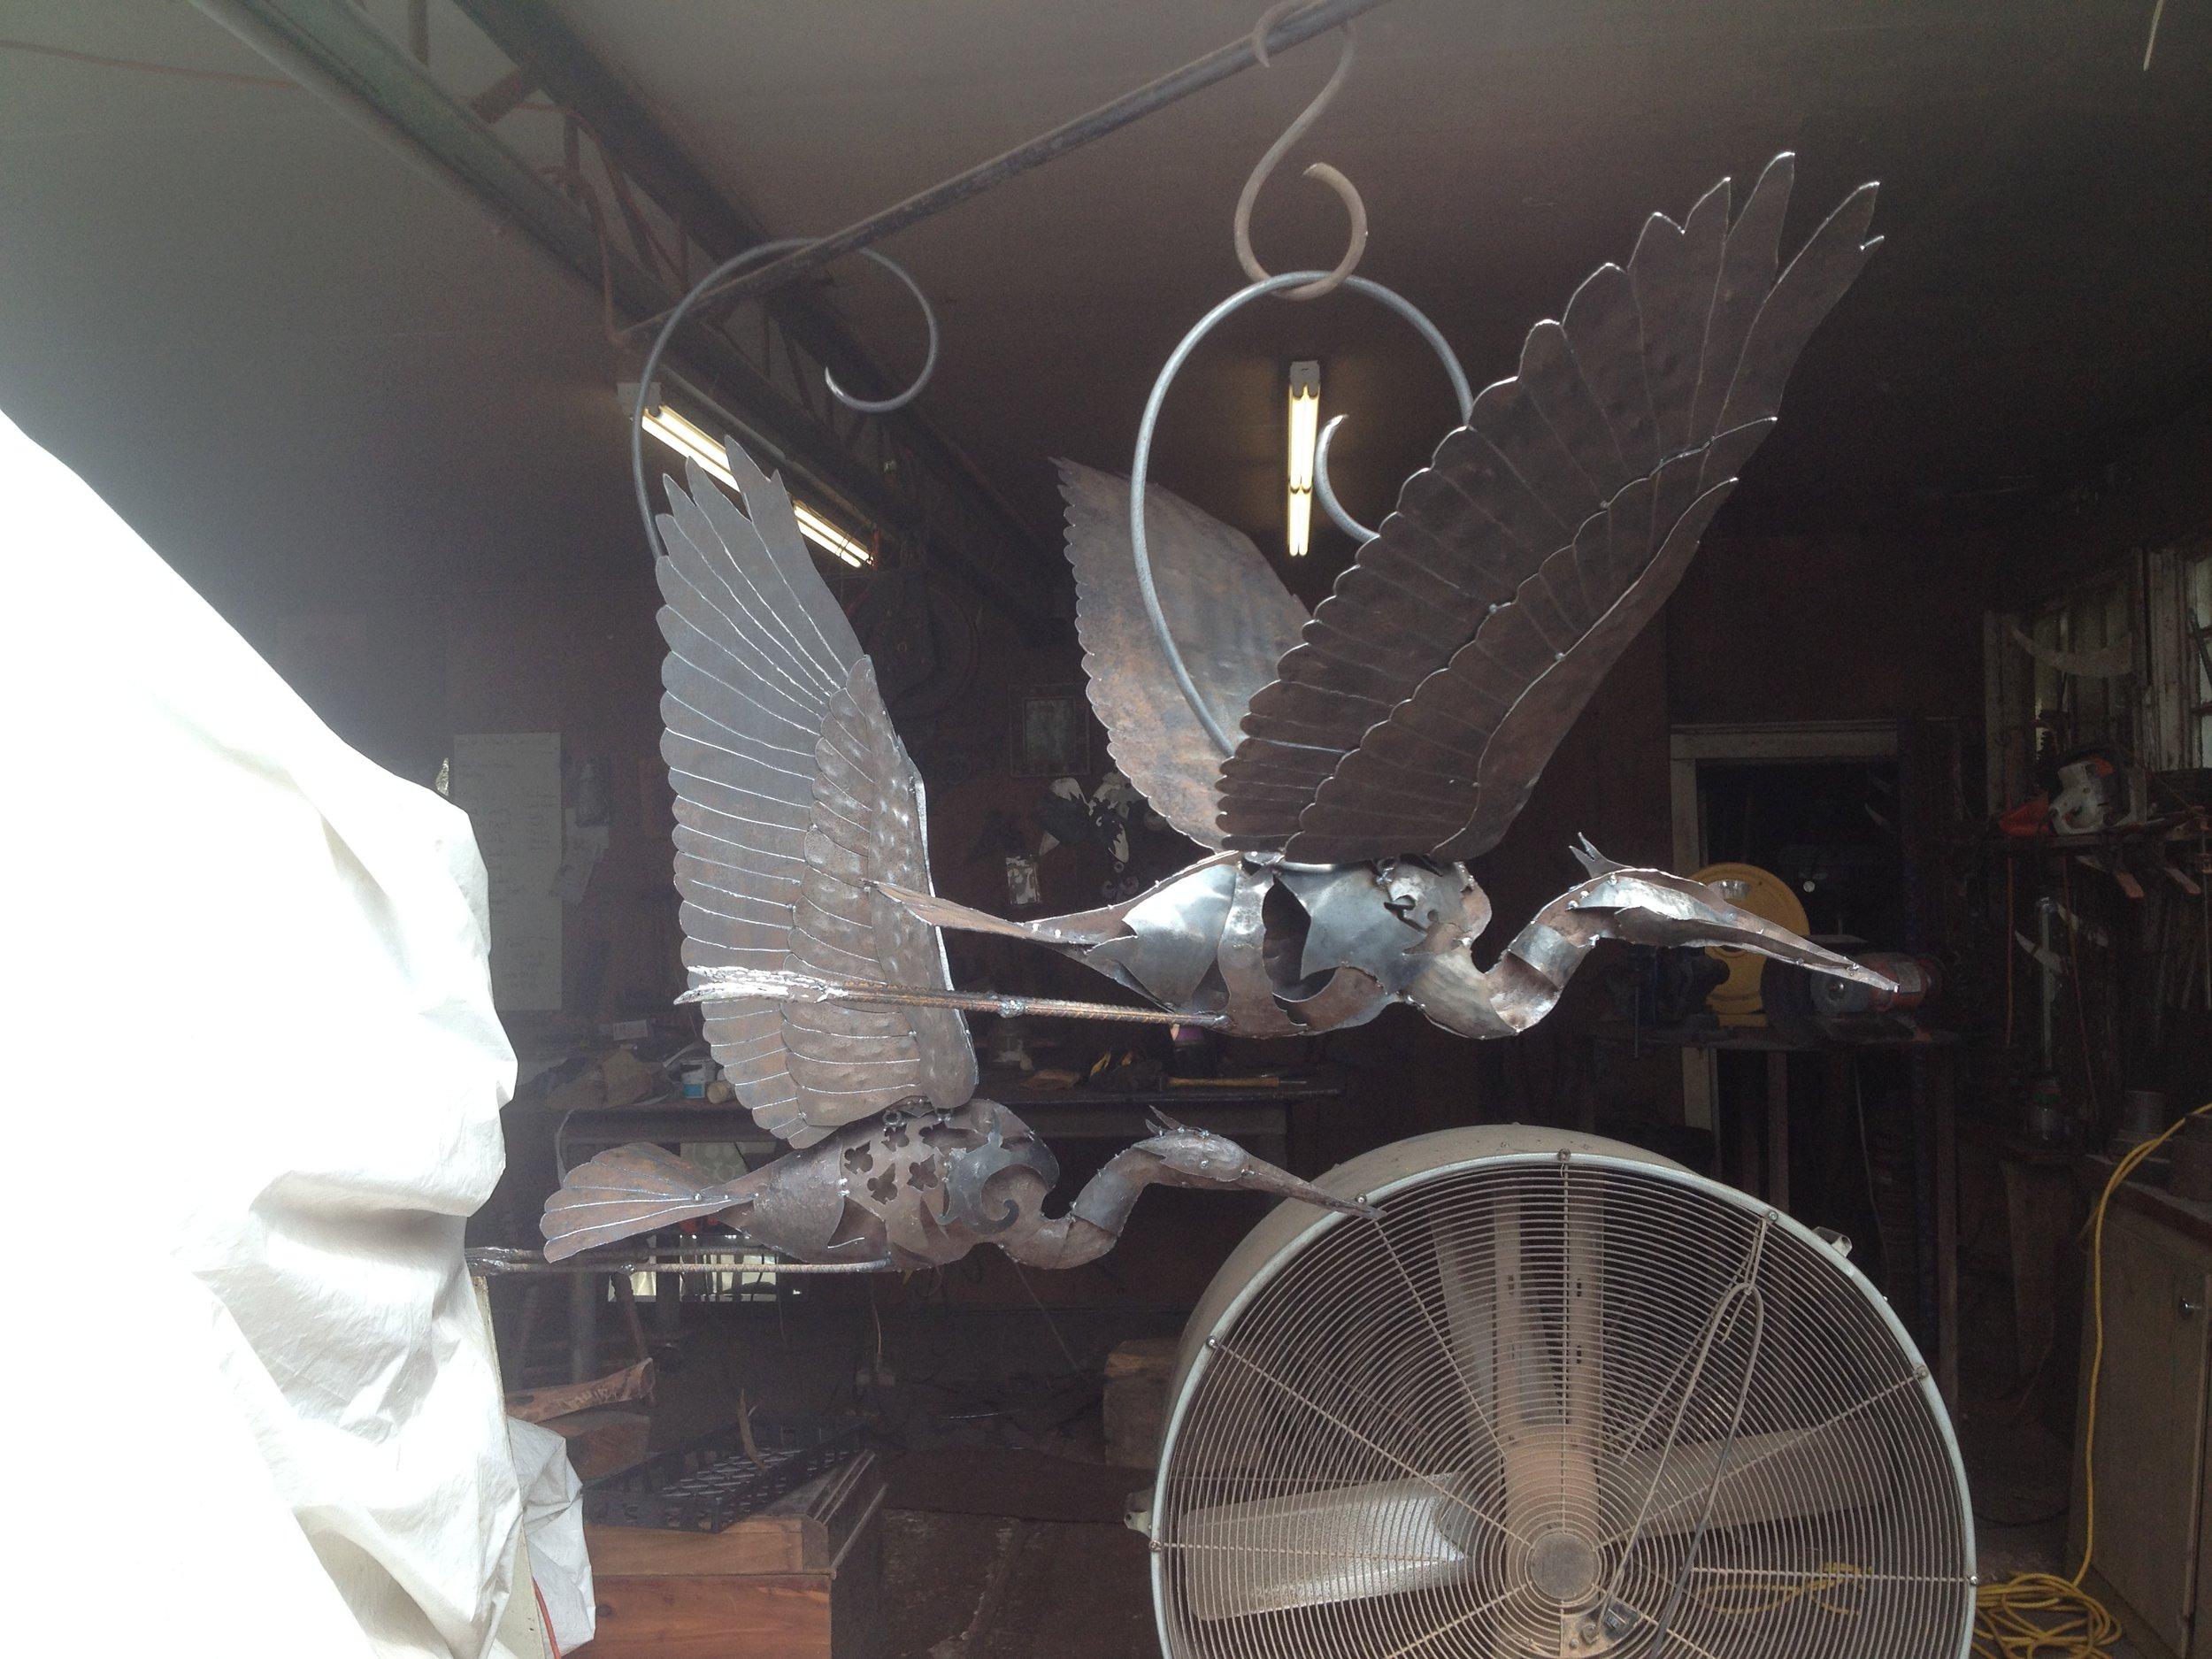 metal-egrets-raw_26435672702_o.jpg